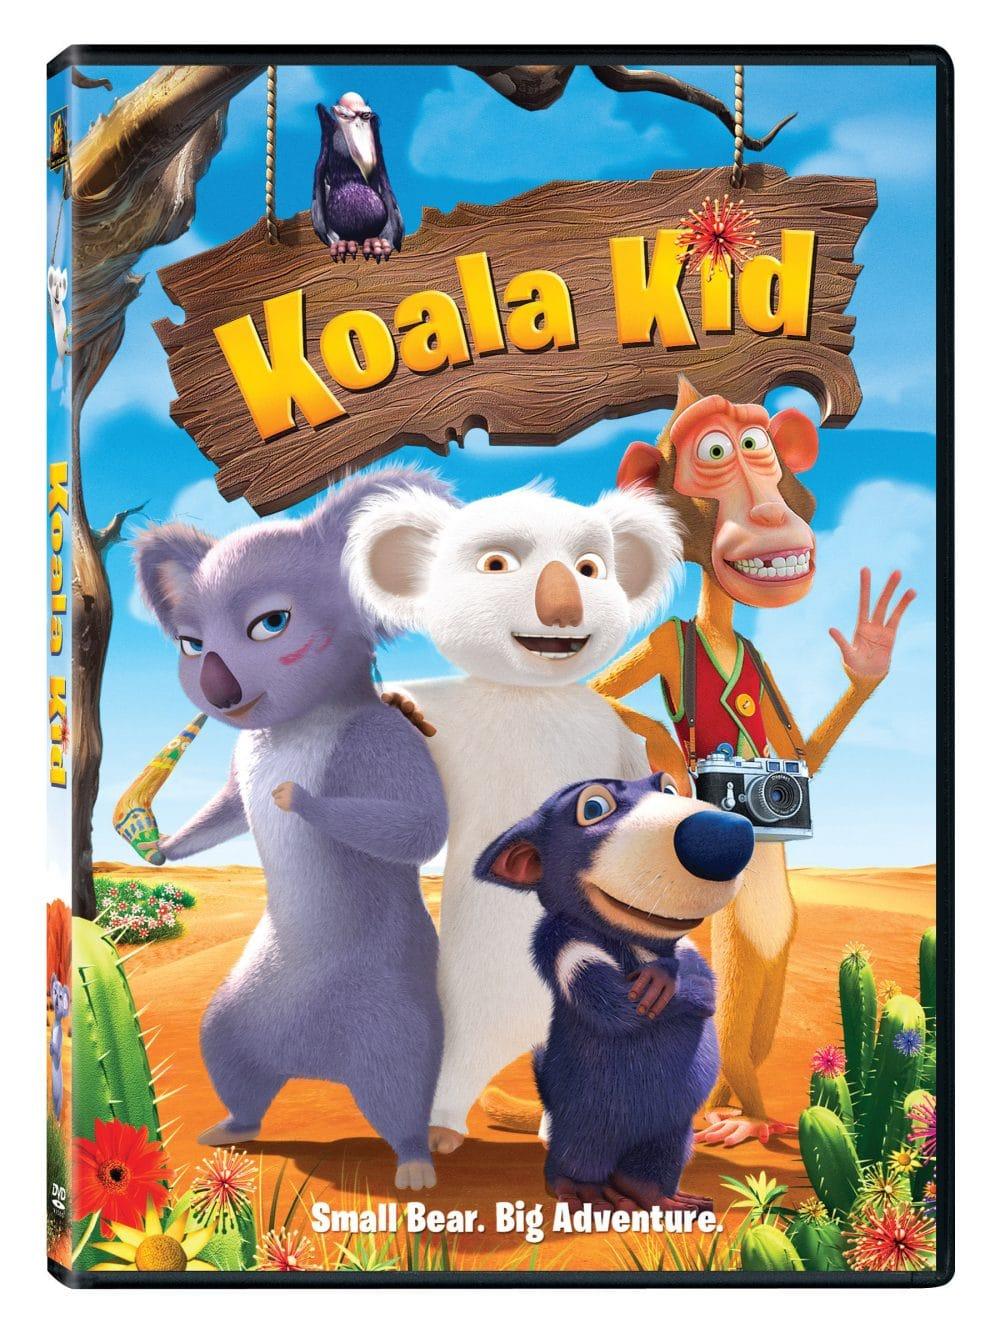 Koala Kid Movie Review